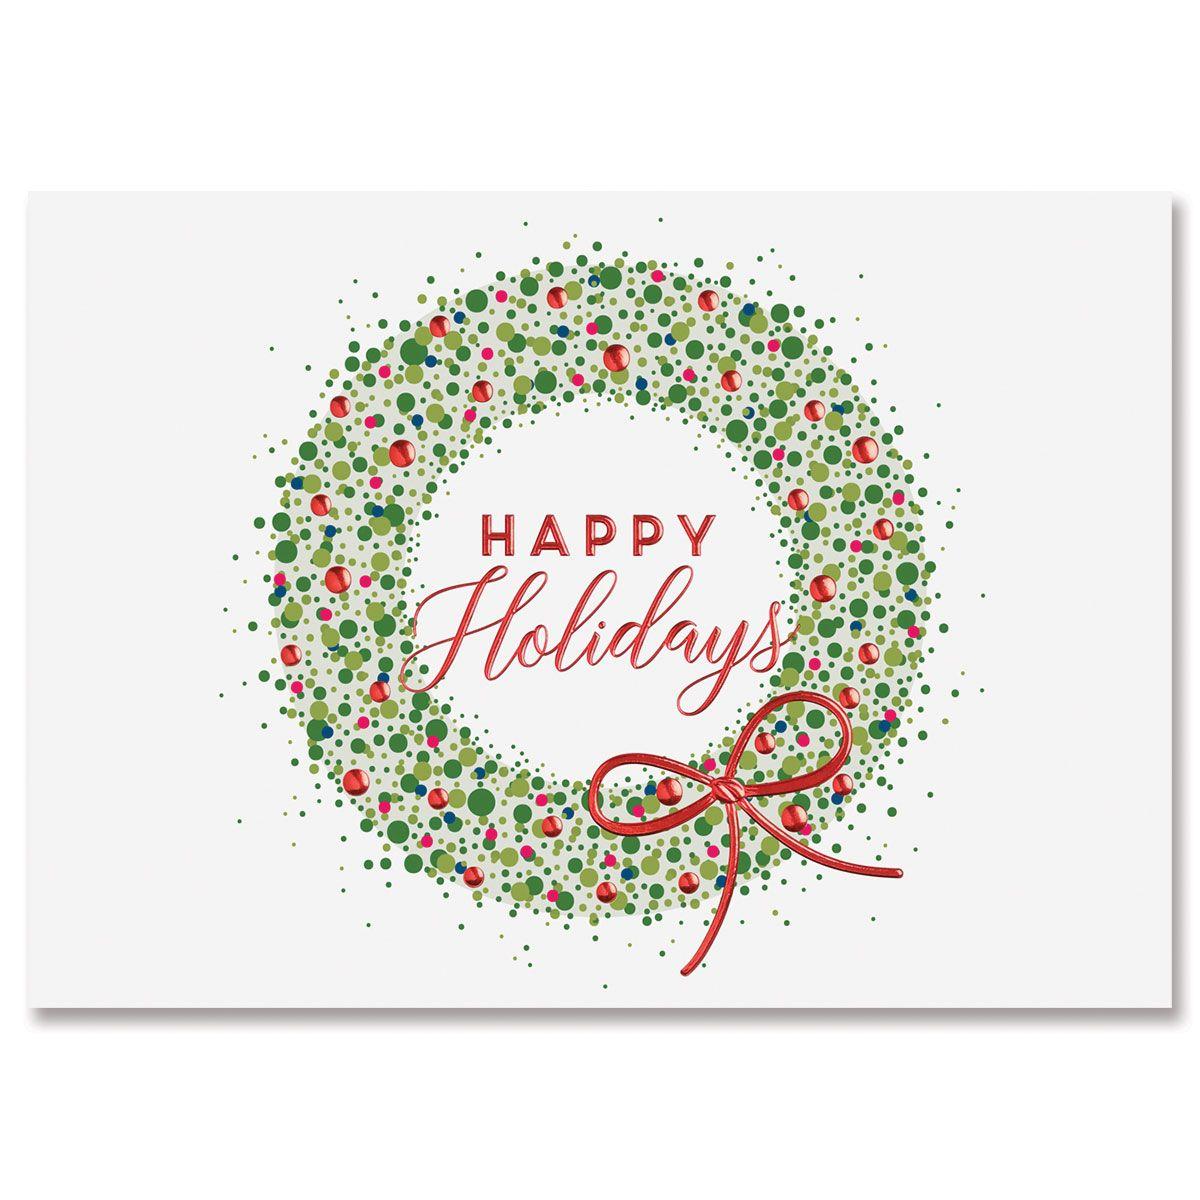 Delightful Wreath Greeting Card